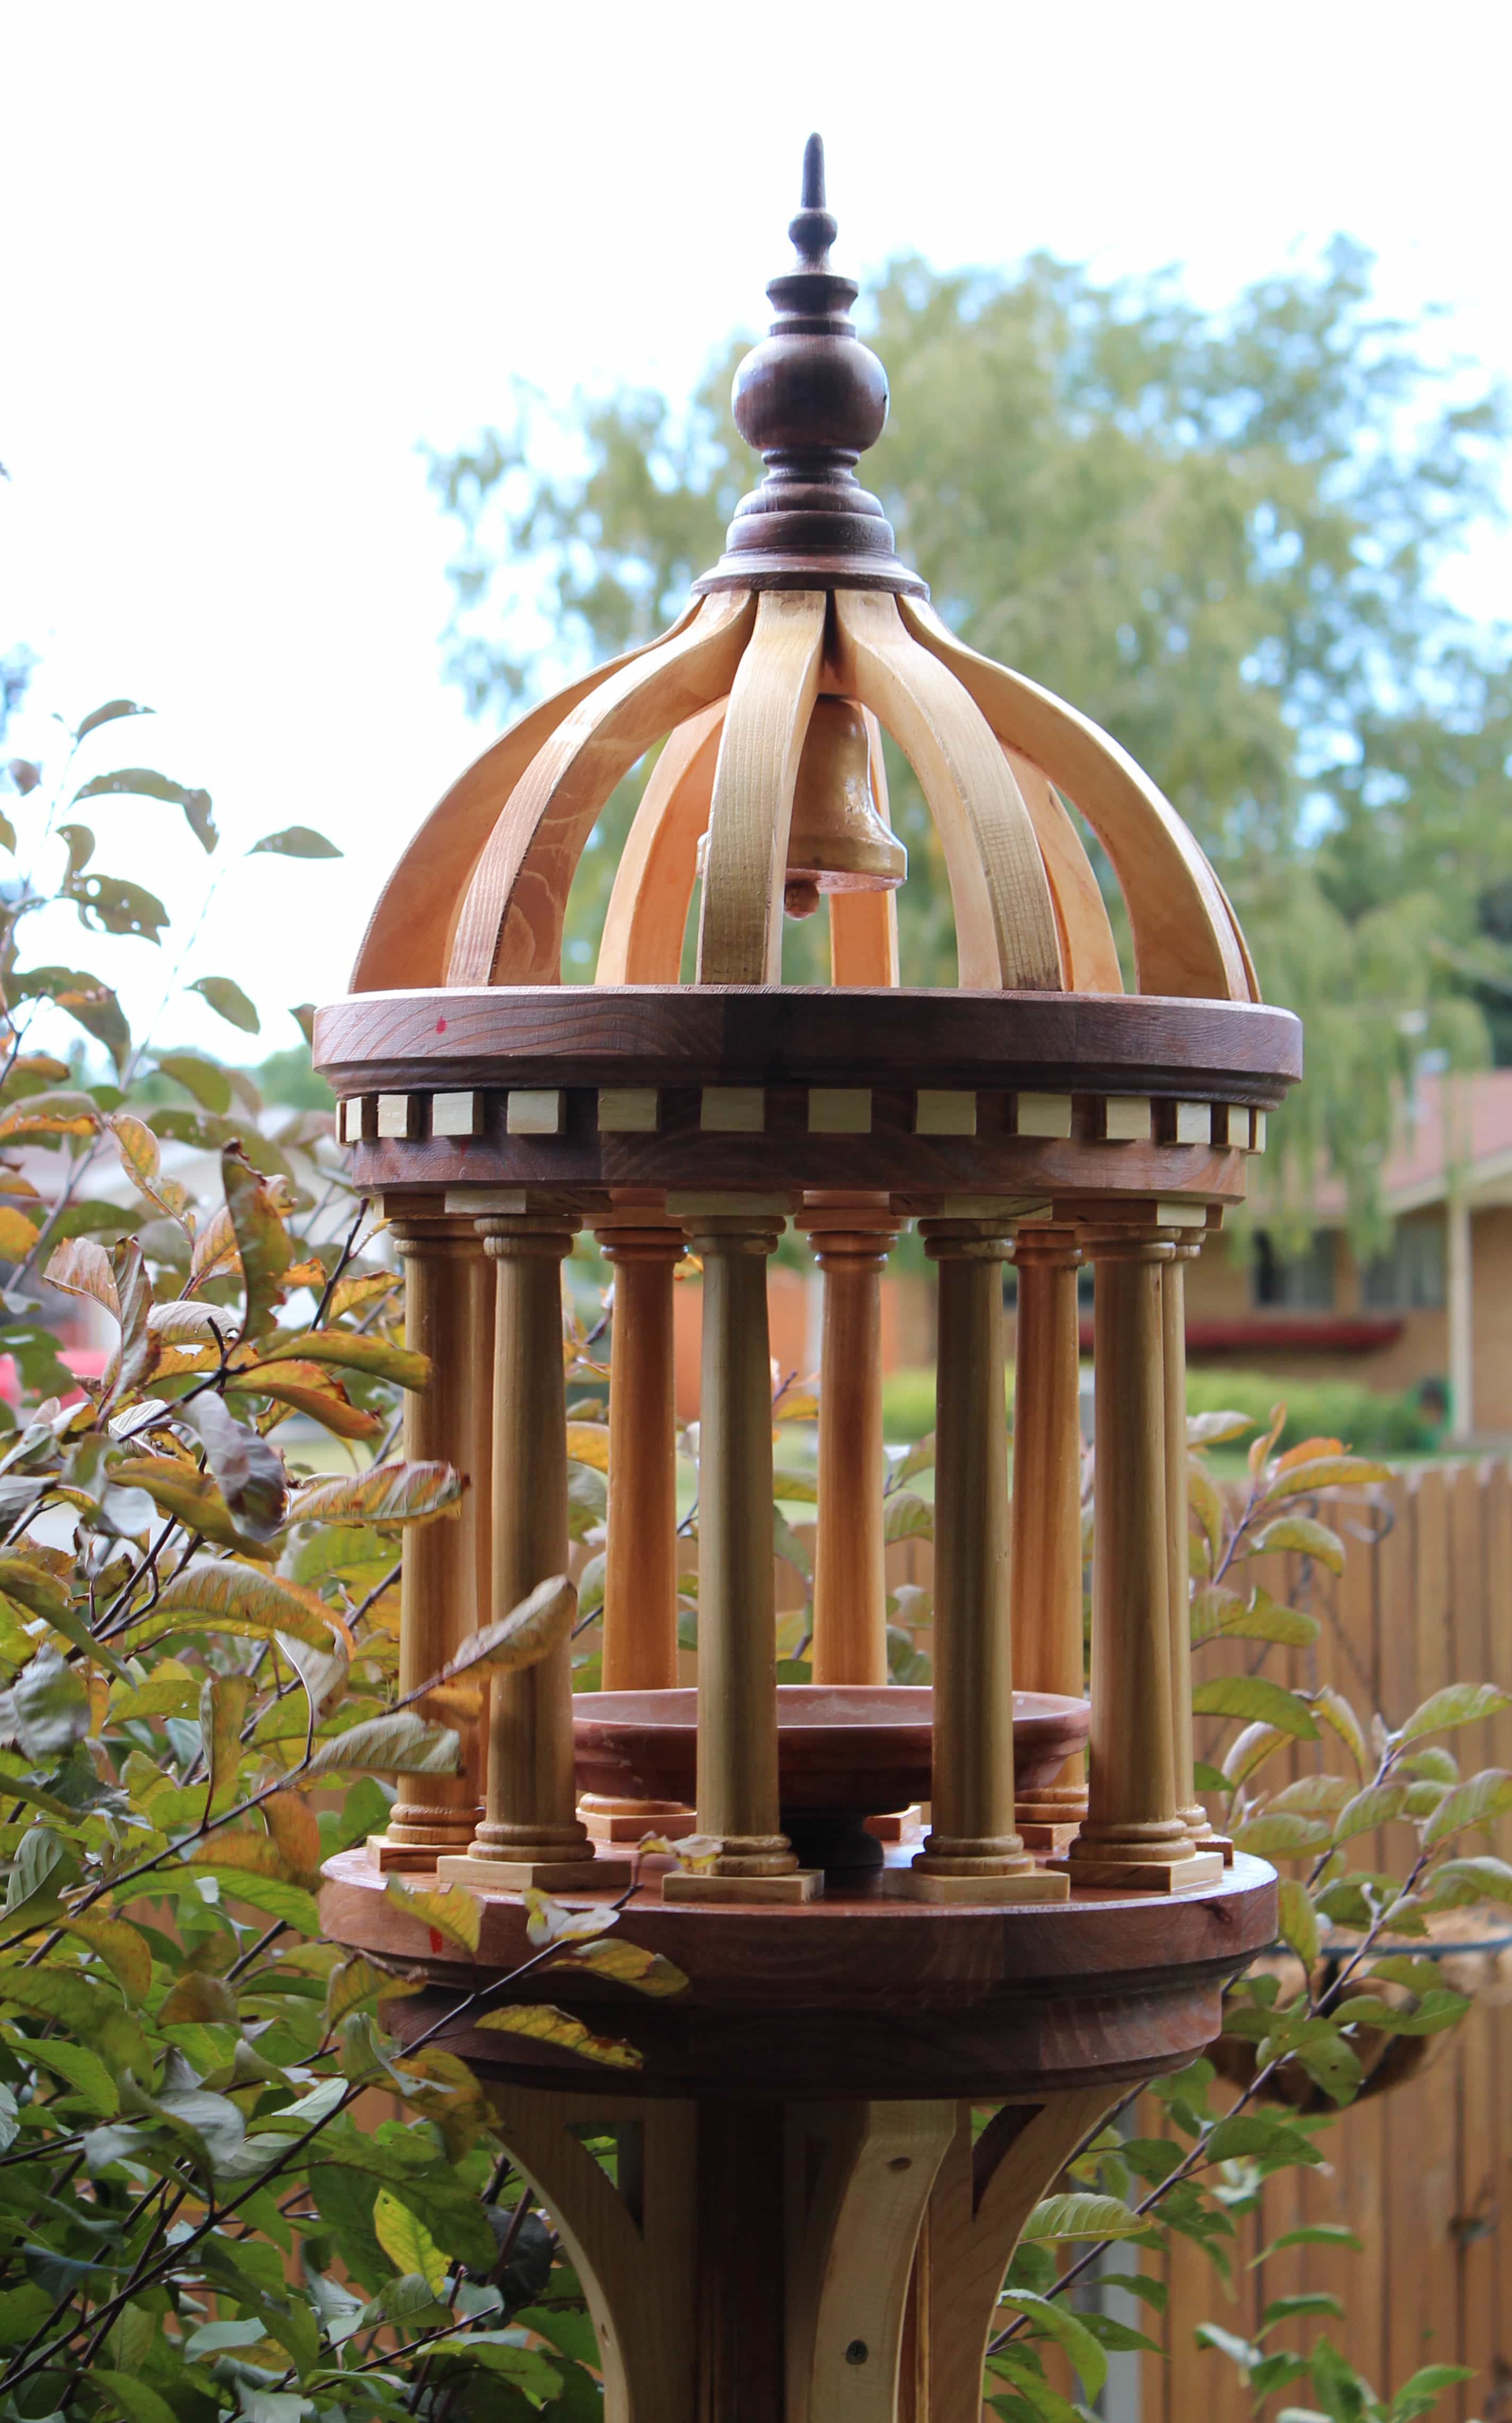 Tuscany Bird Feeder Woodworking Plan - Forest Street Designs